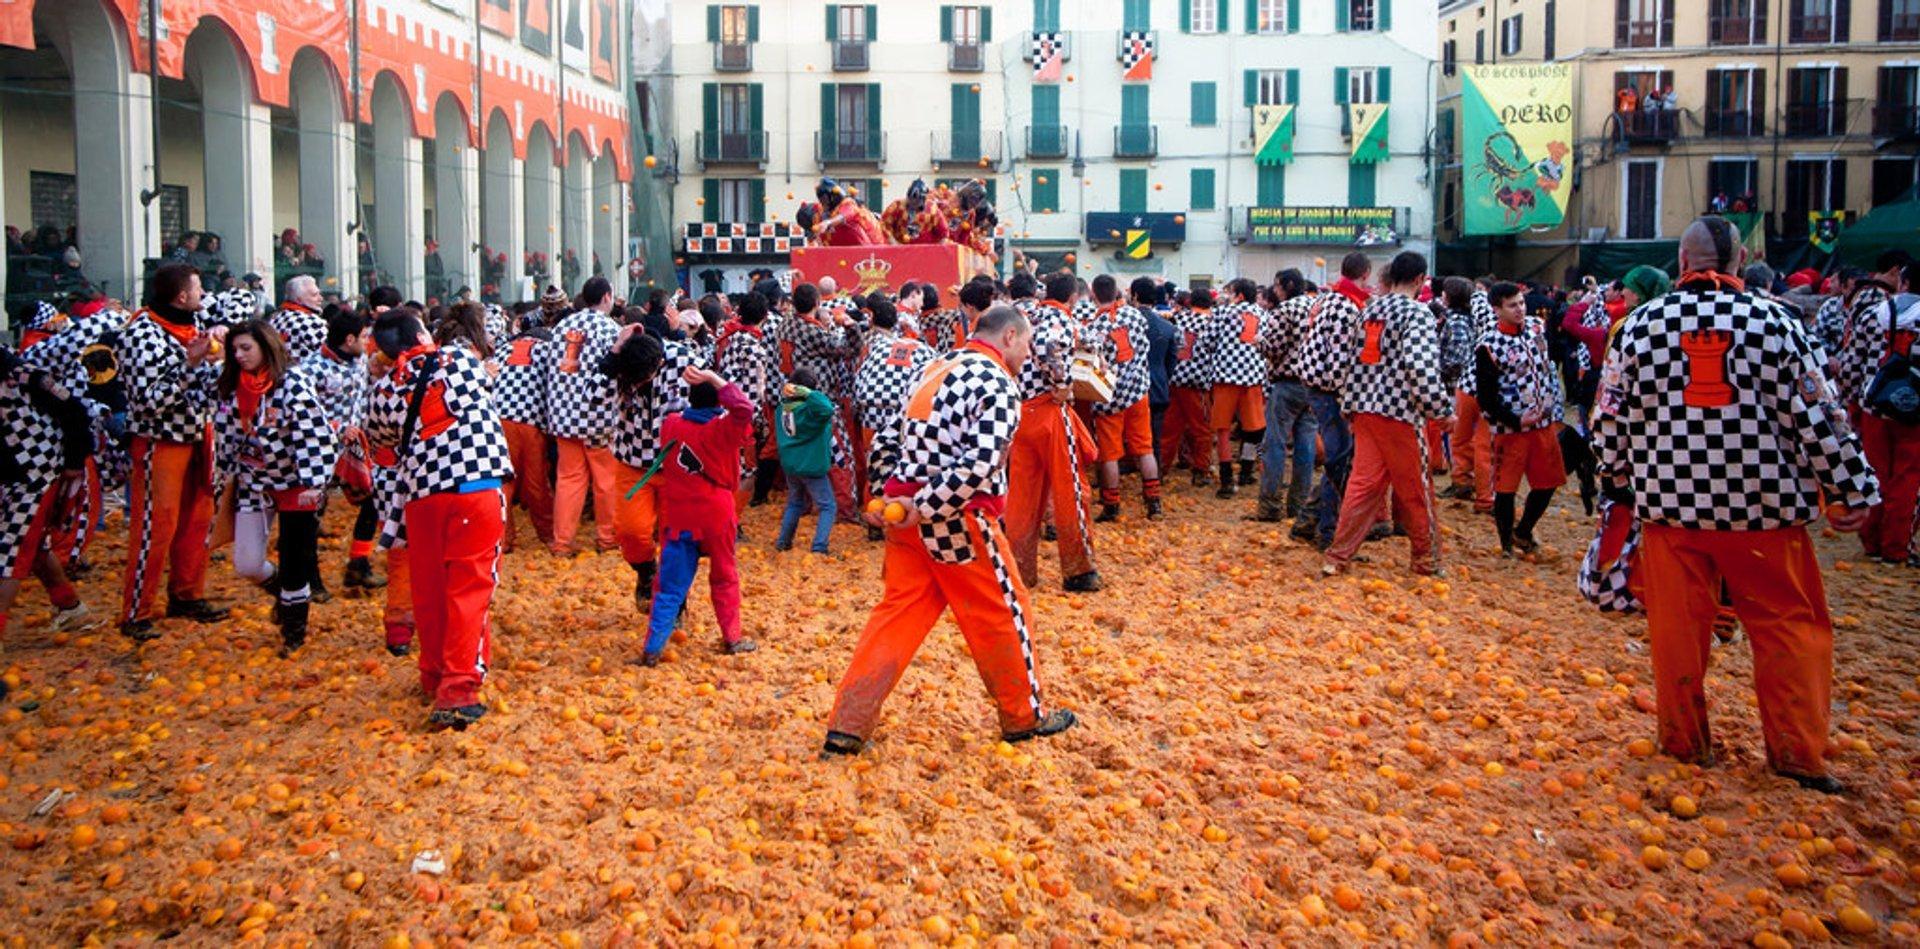 Ivrea Carnival 2020